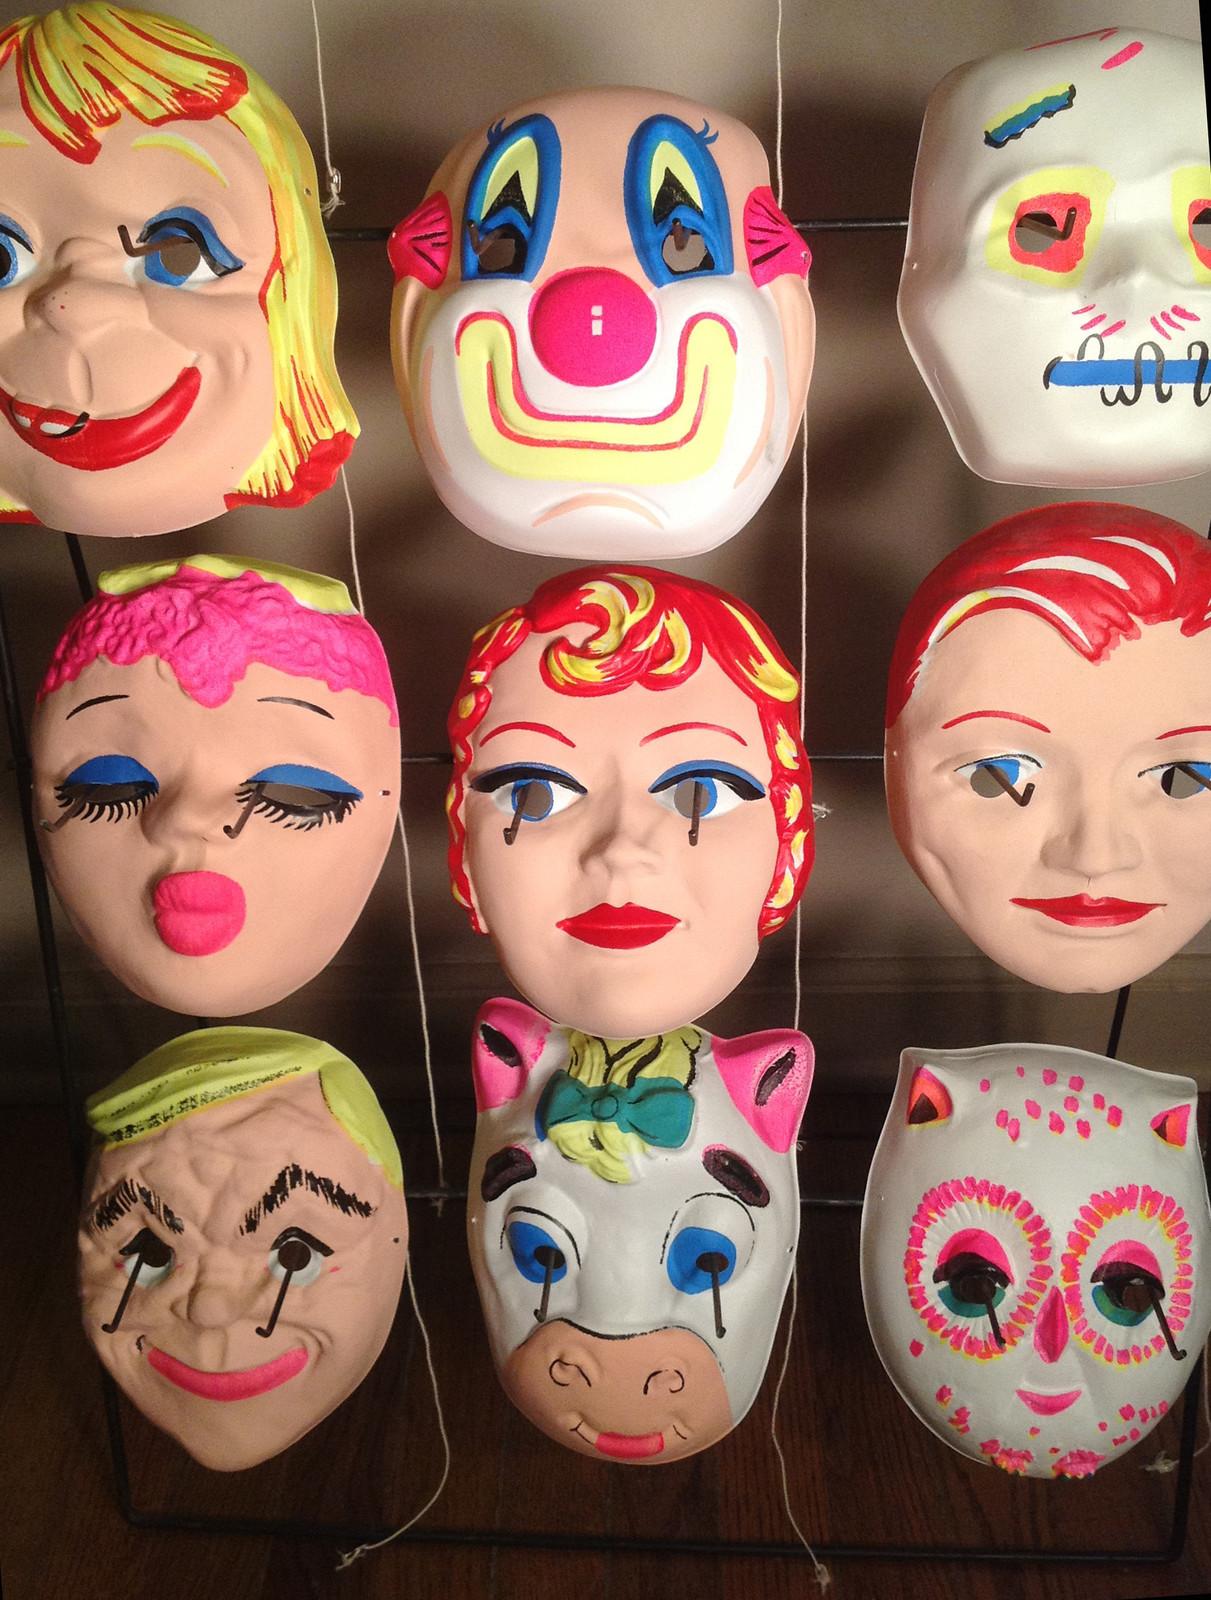 Dessart Daylight Fluorescent Halloween Mask Display | Blood ...